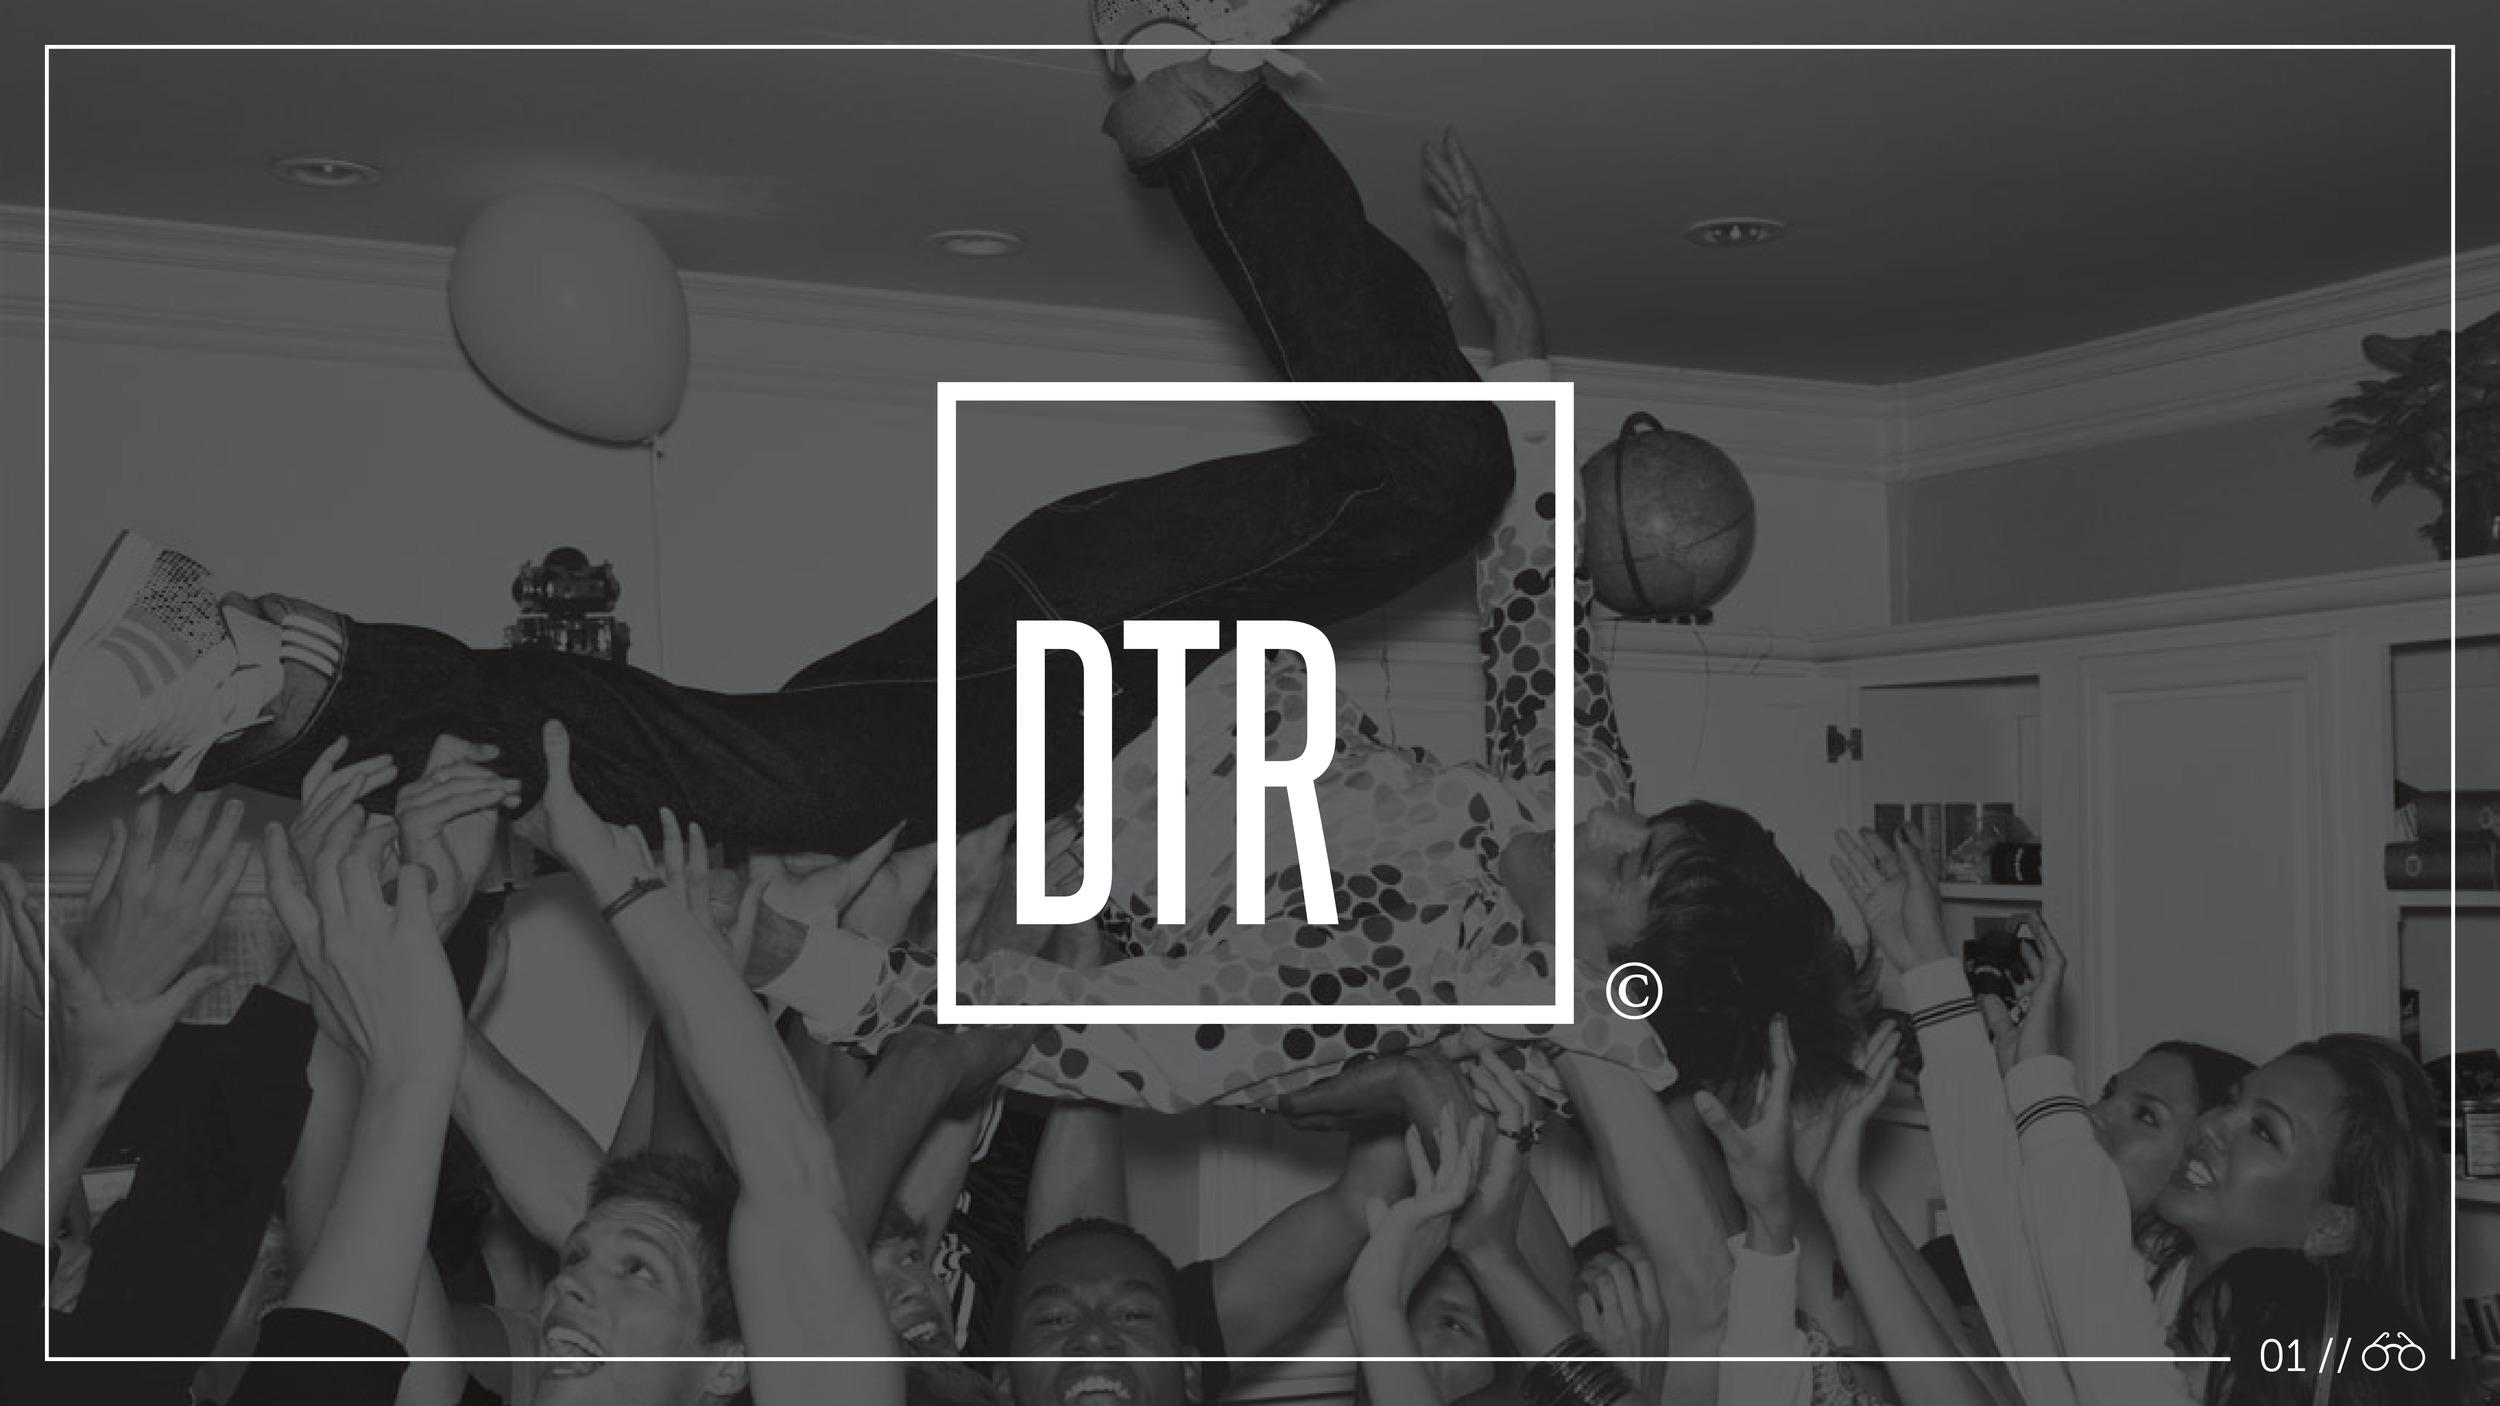 dtr_deck01.jpg